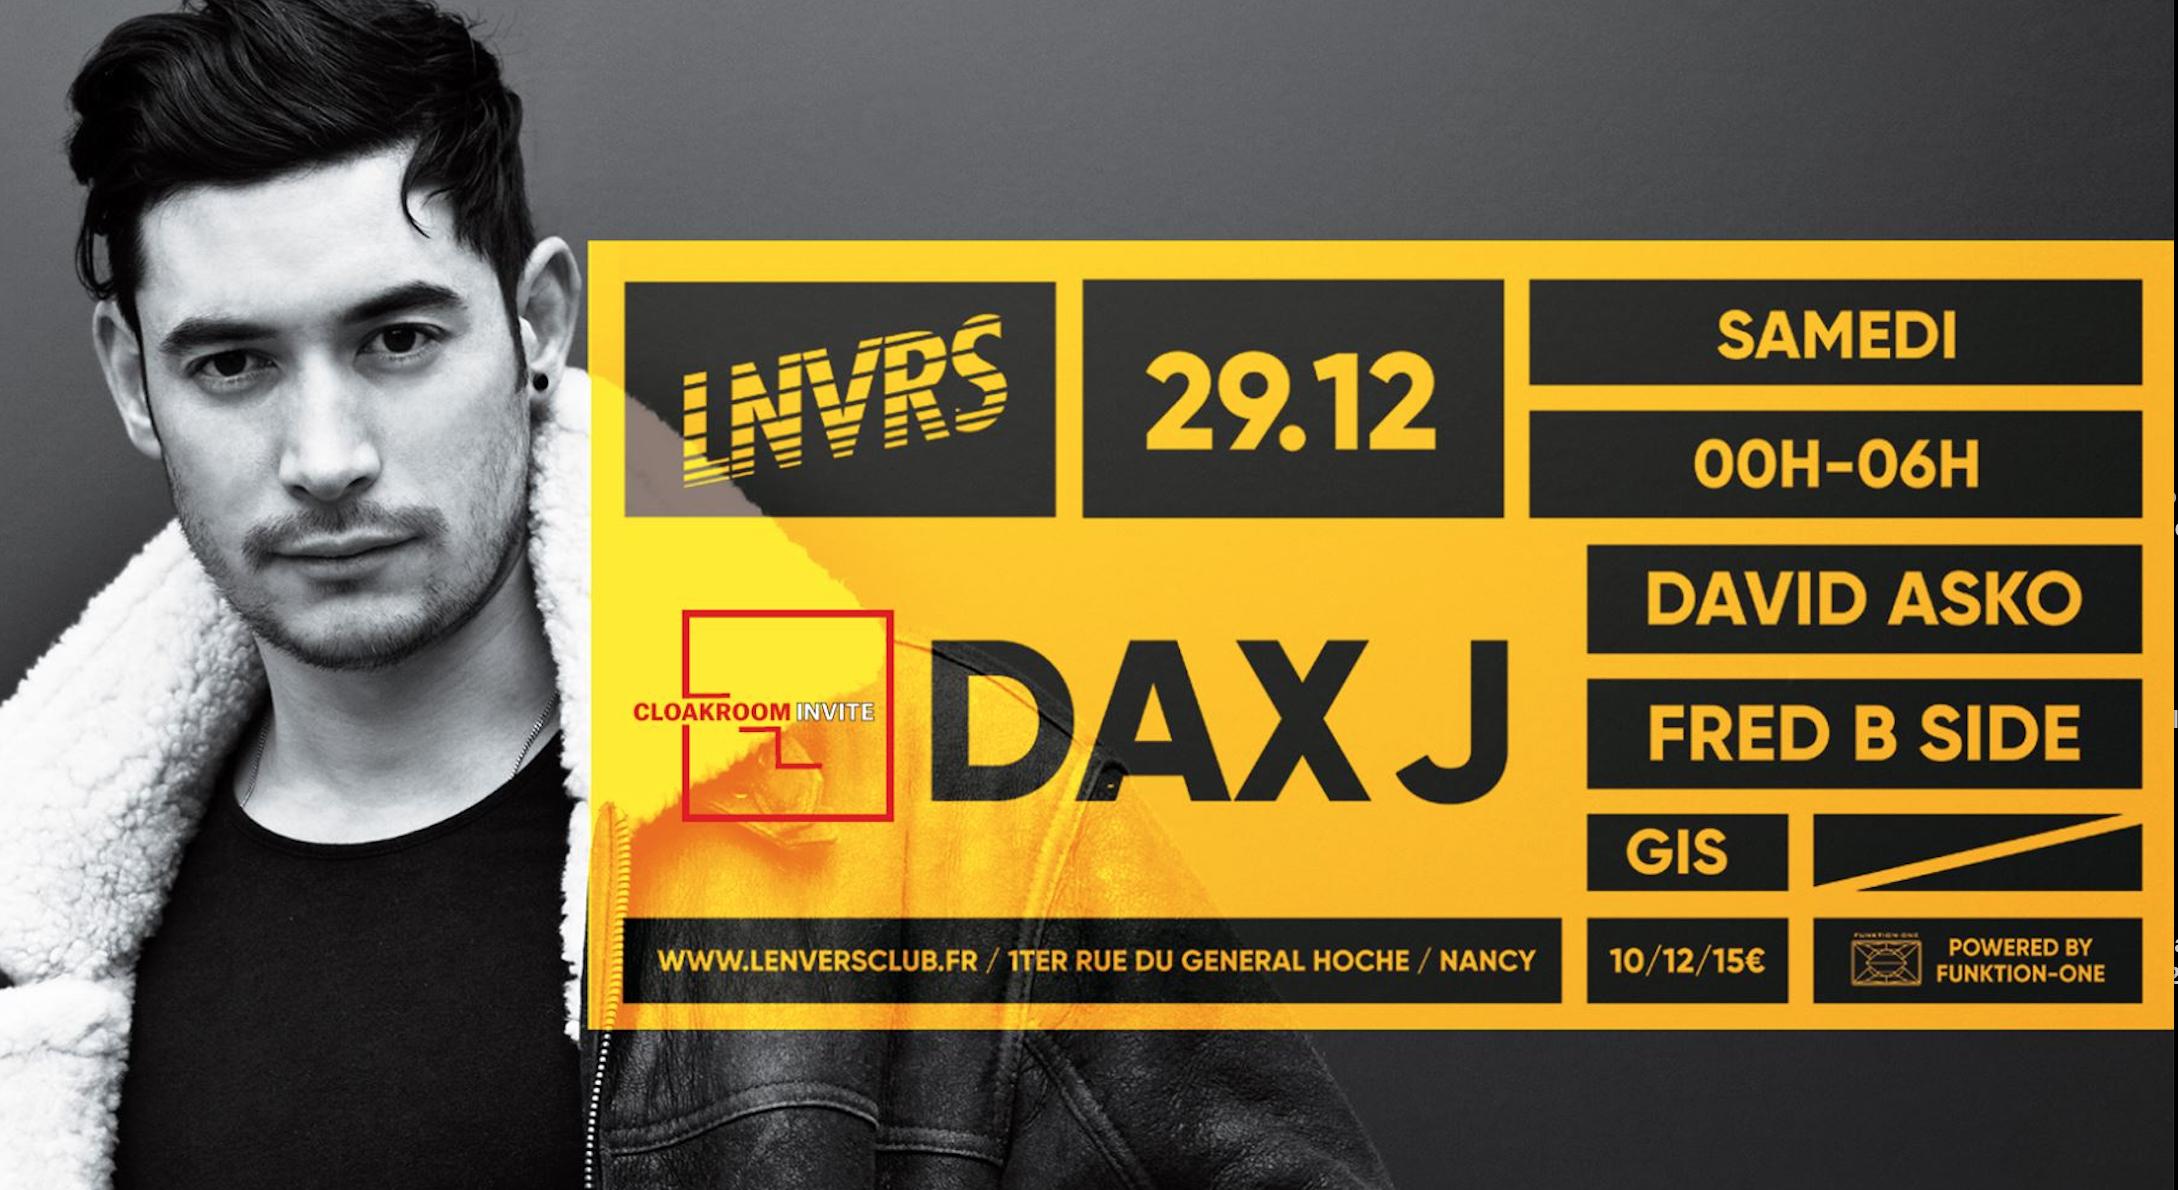 Cloakroom Invite Dax J